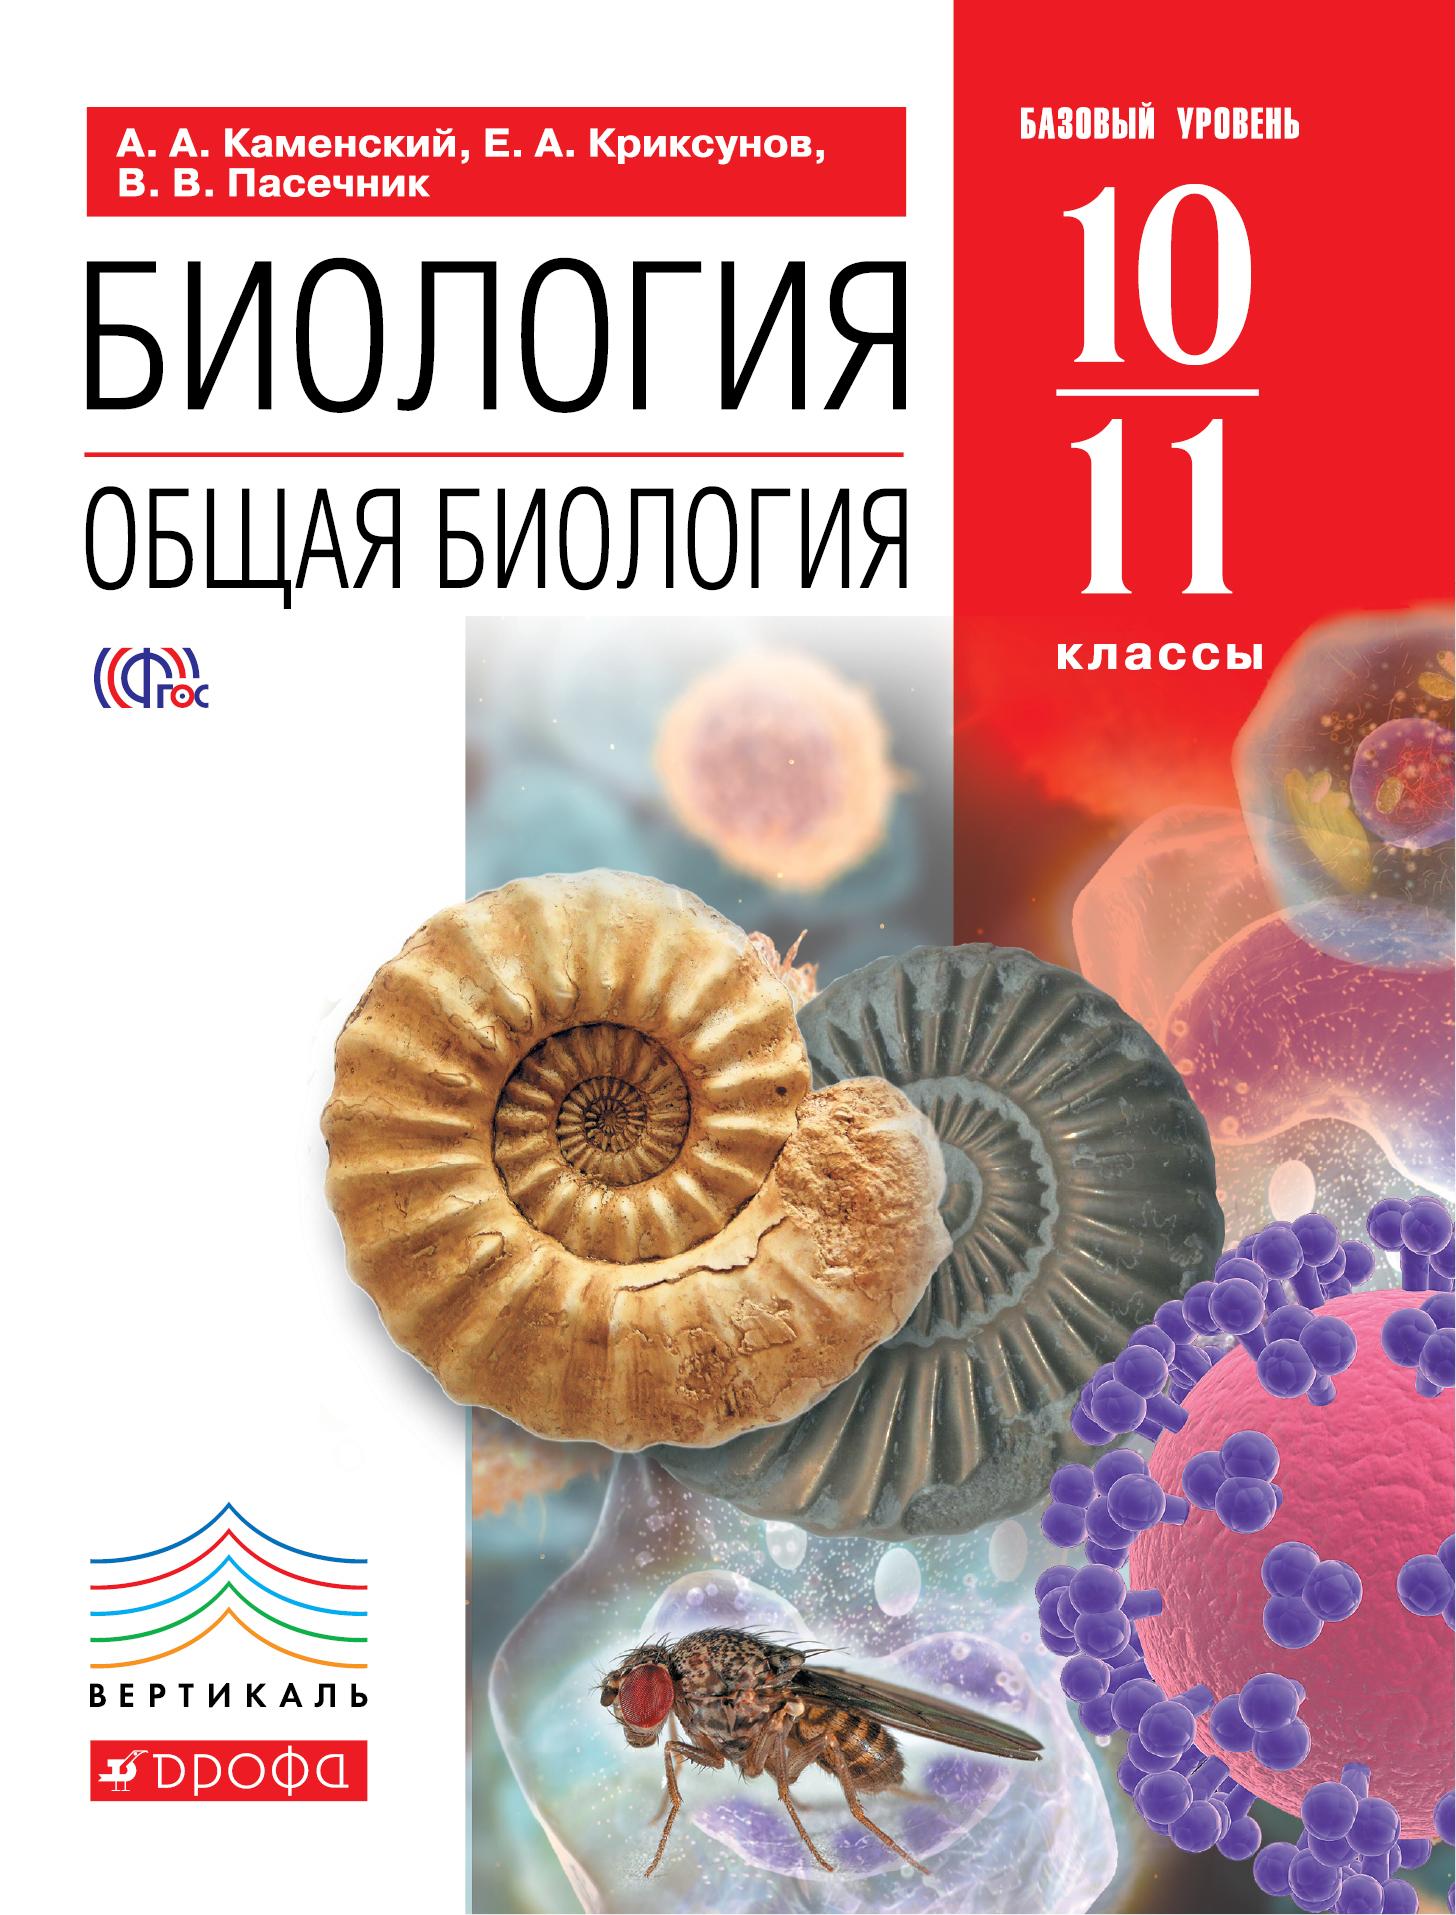 Общая биология 10-11кл [Учебник]баз. ур. Верт. ФП